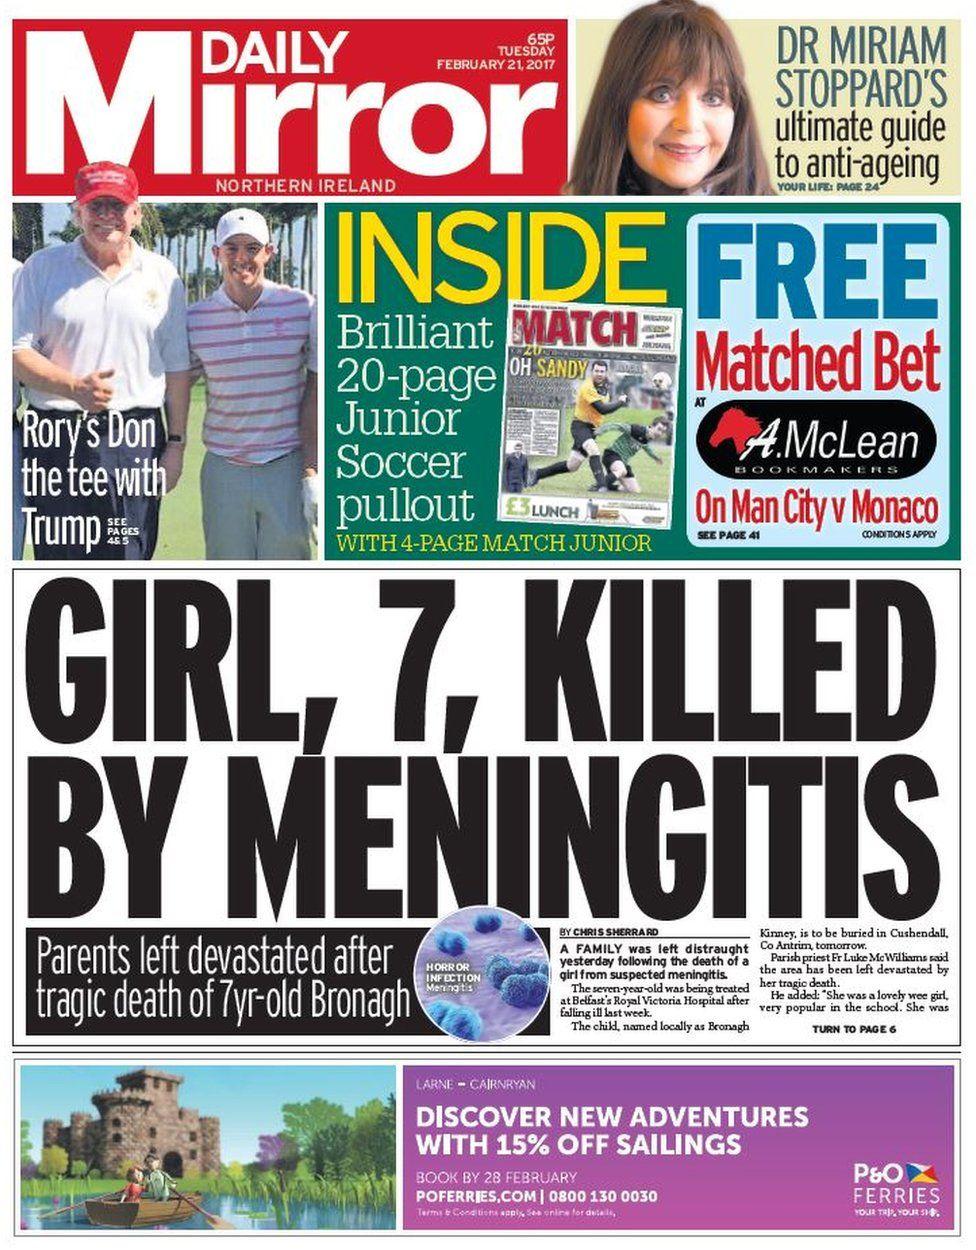 Daily Mirror Tuesday 21 February